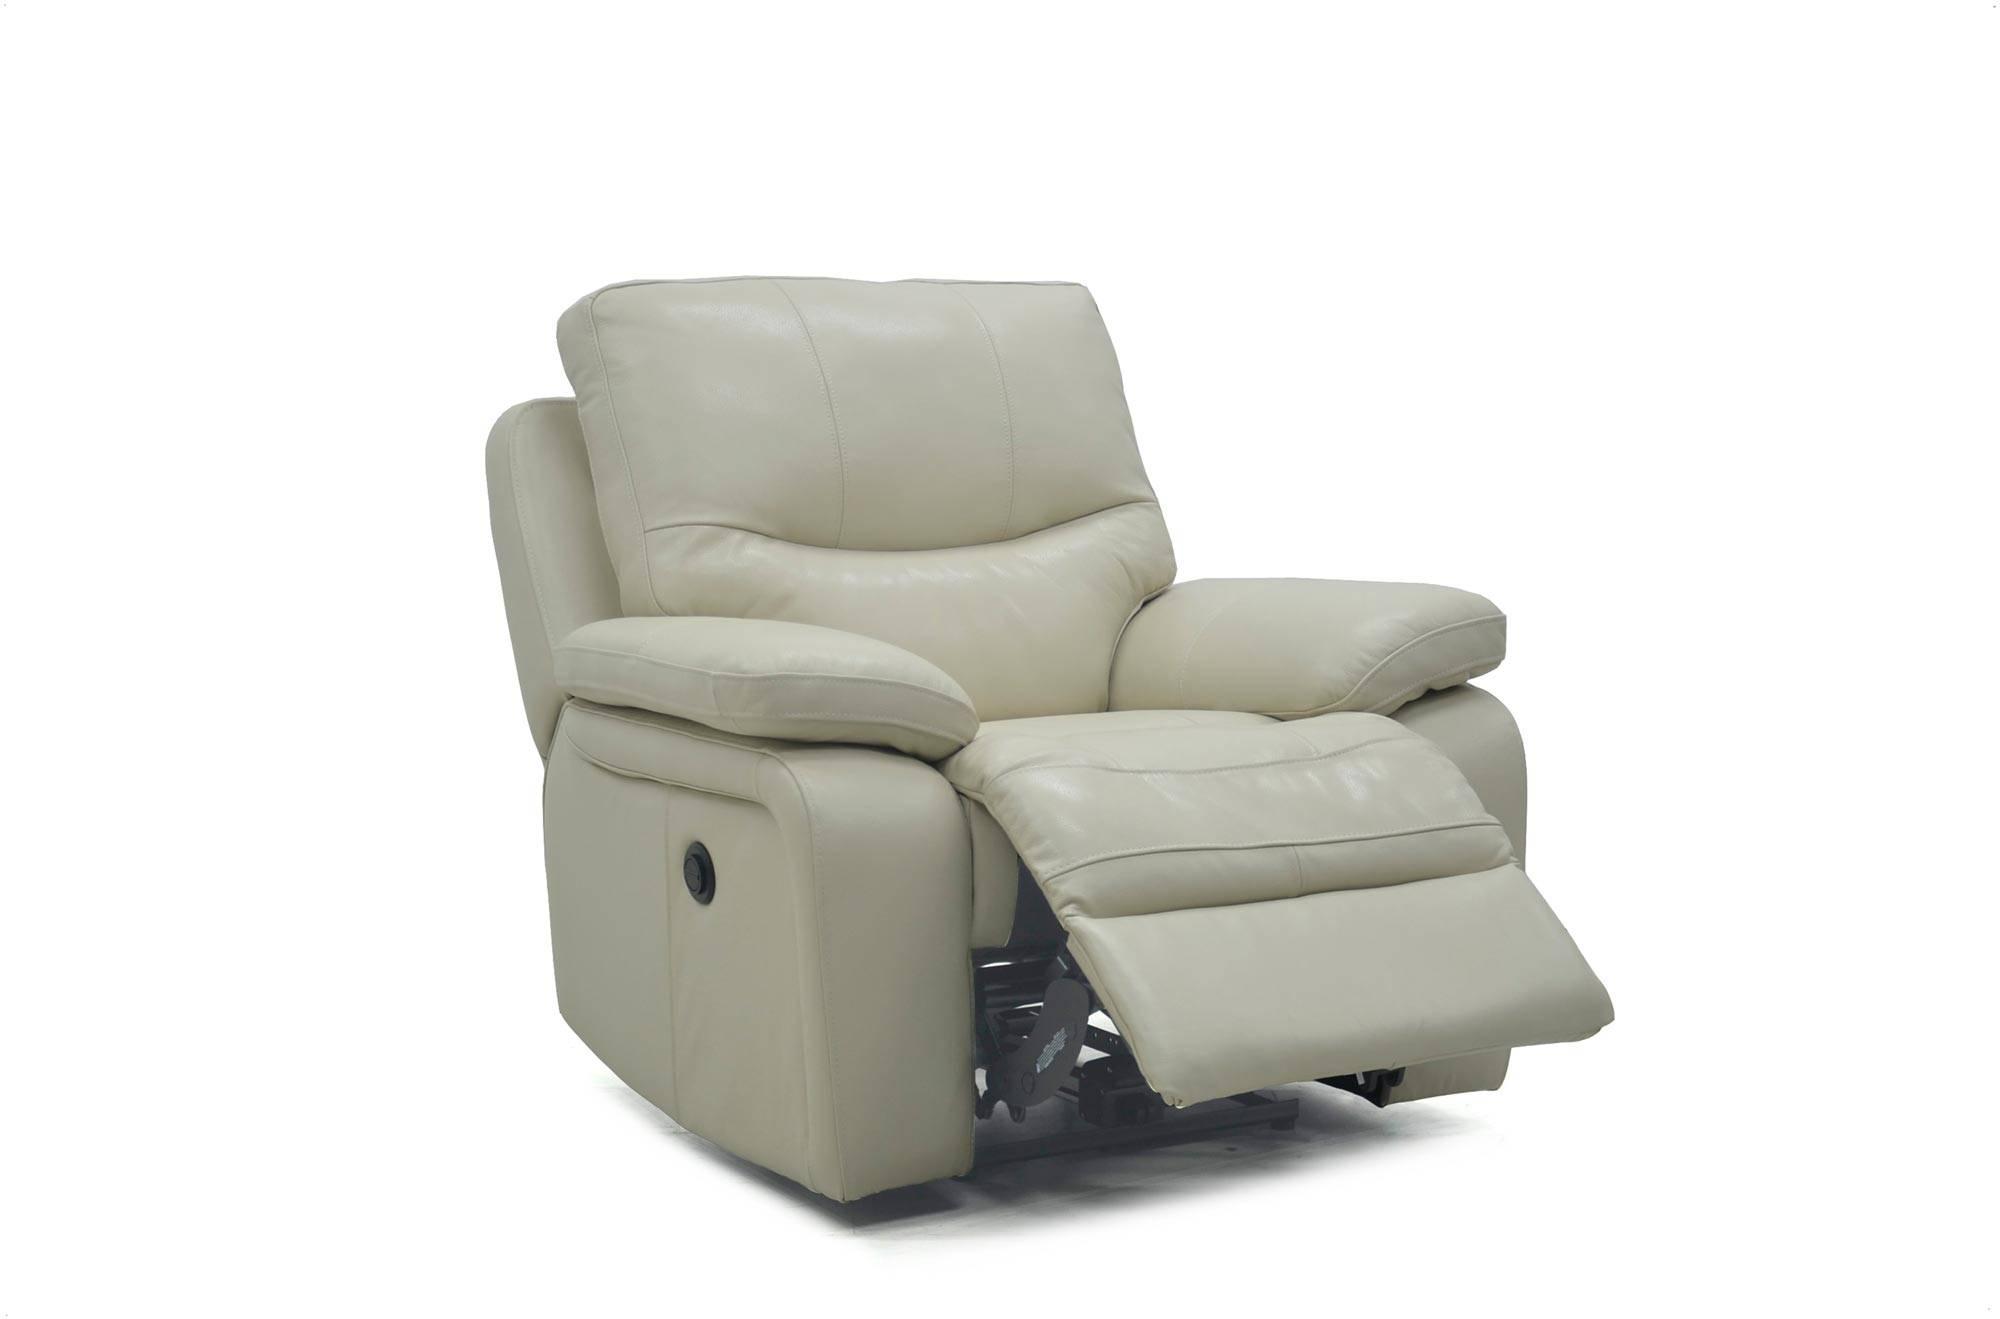 Manhattan Recliner Chair Oldrids Amp Downtown